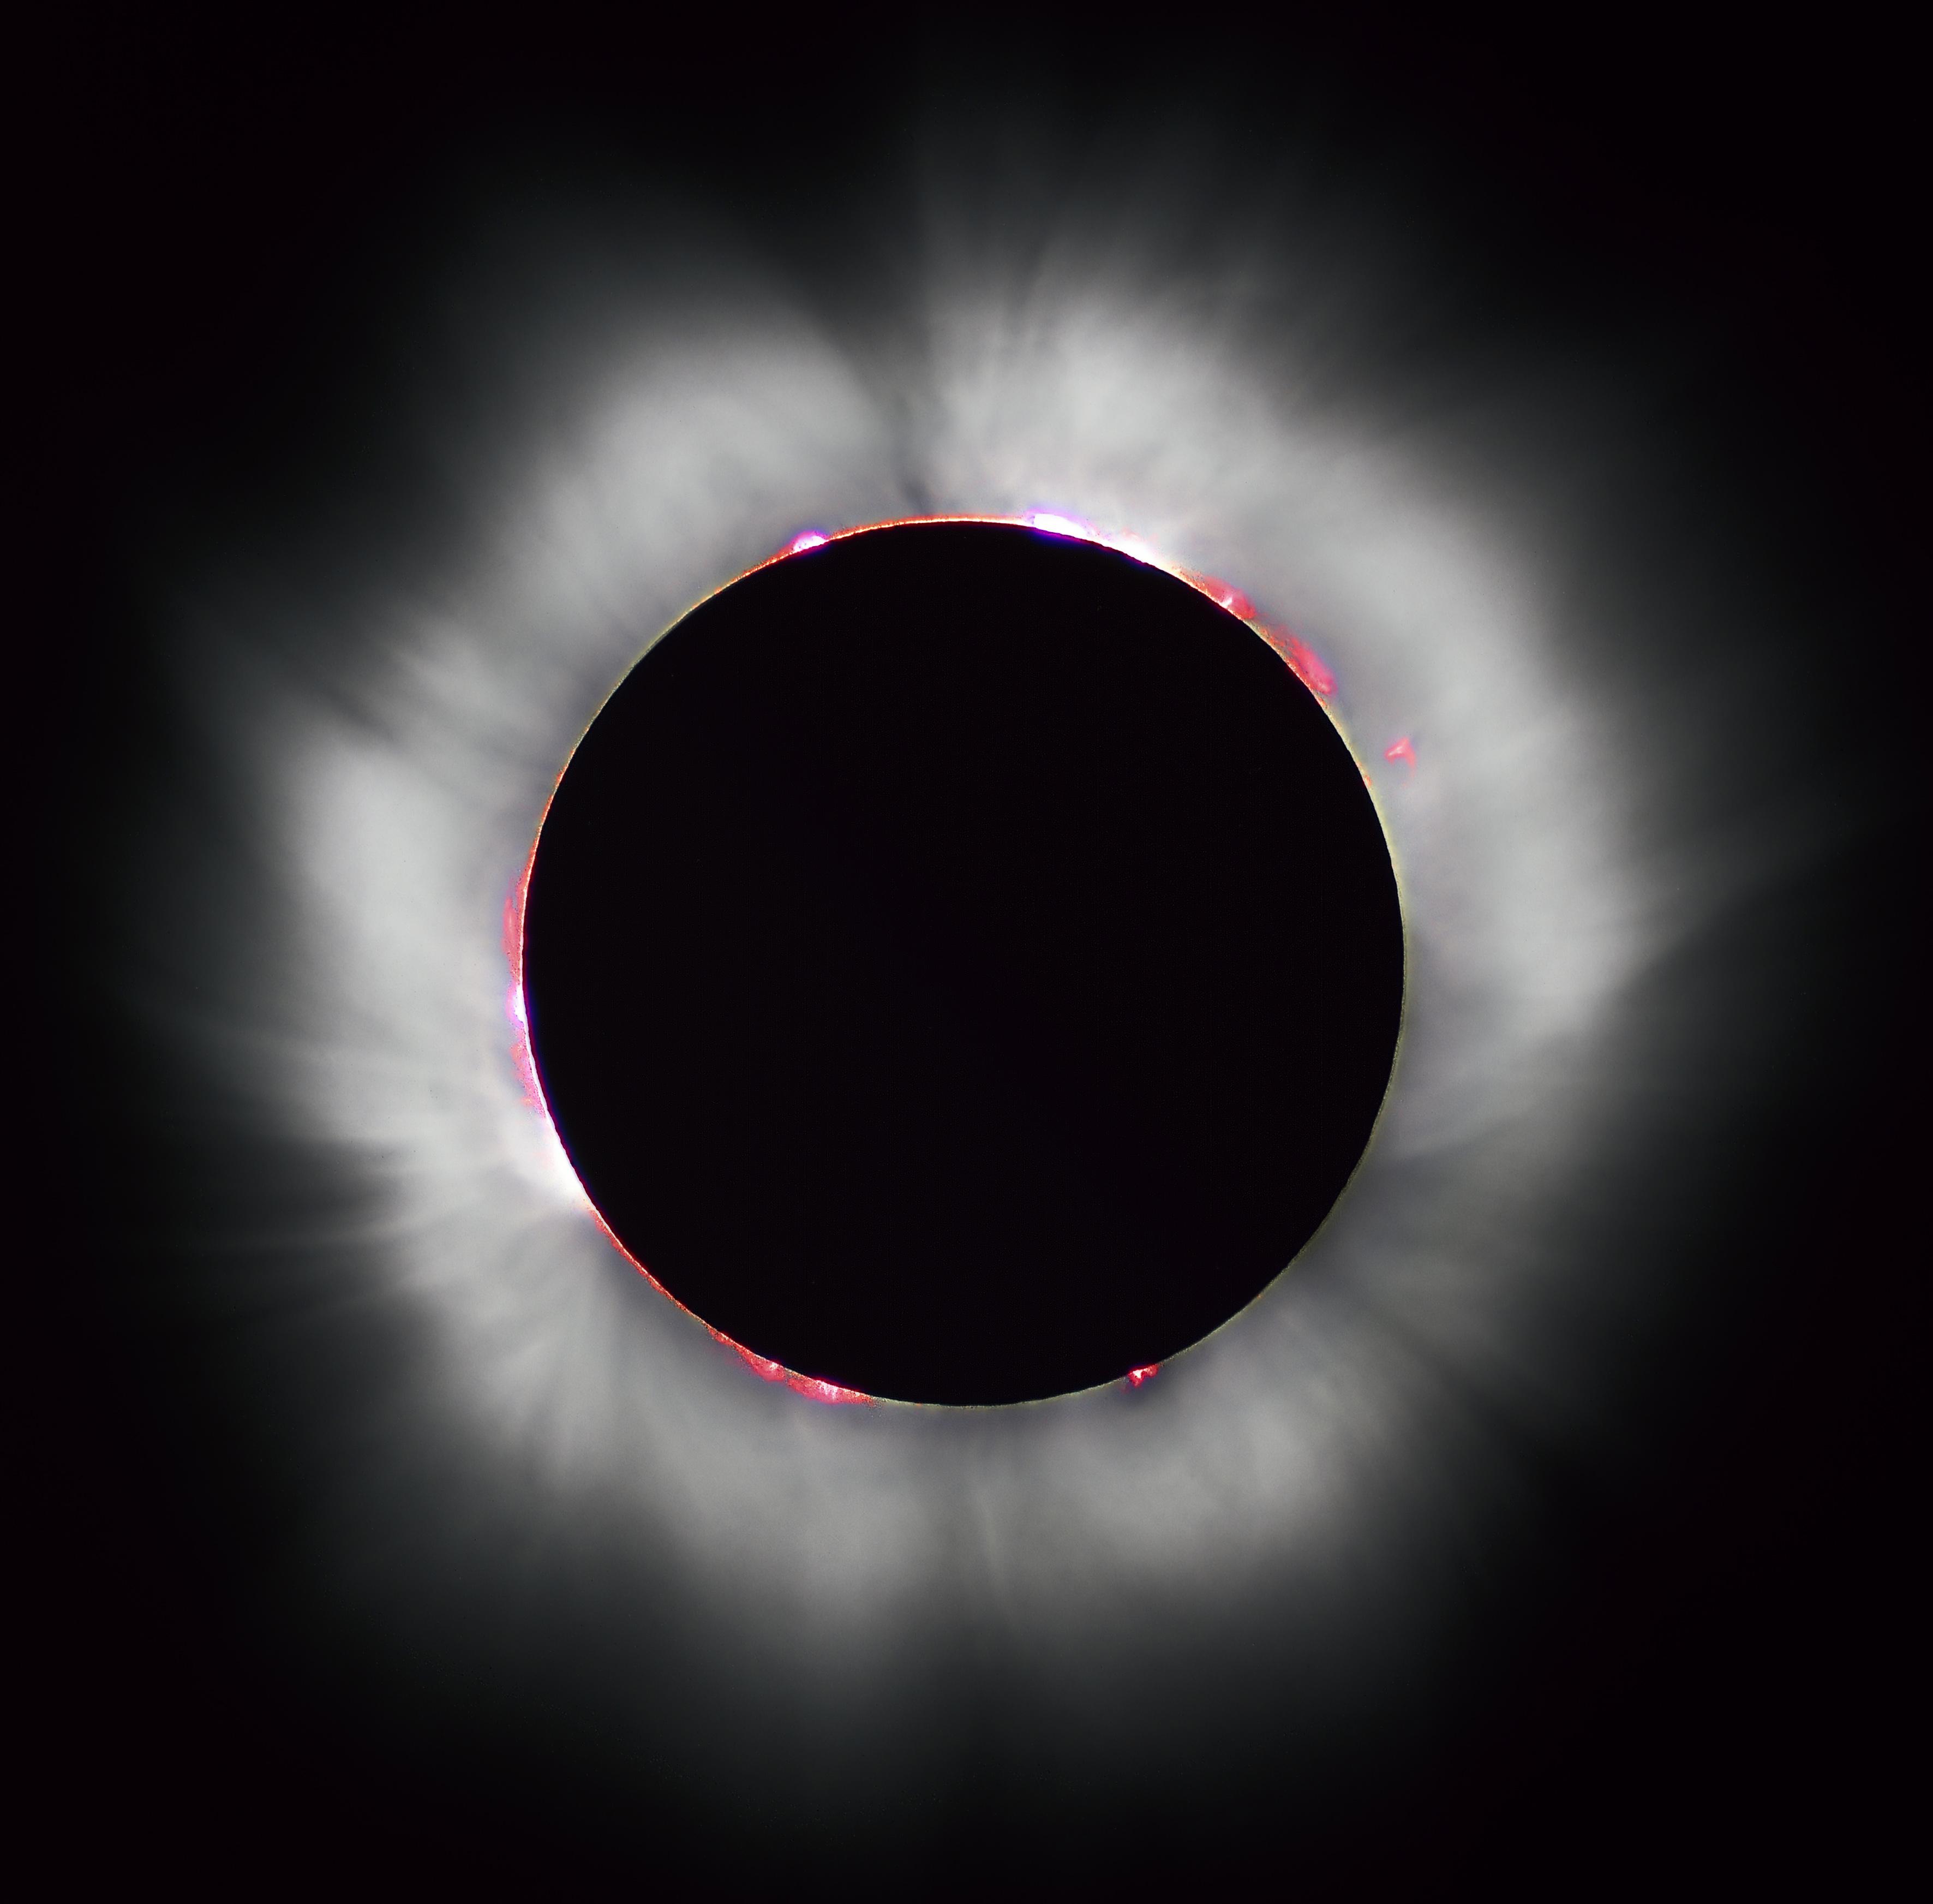 Solareclipsethumbnail